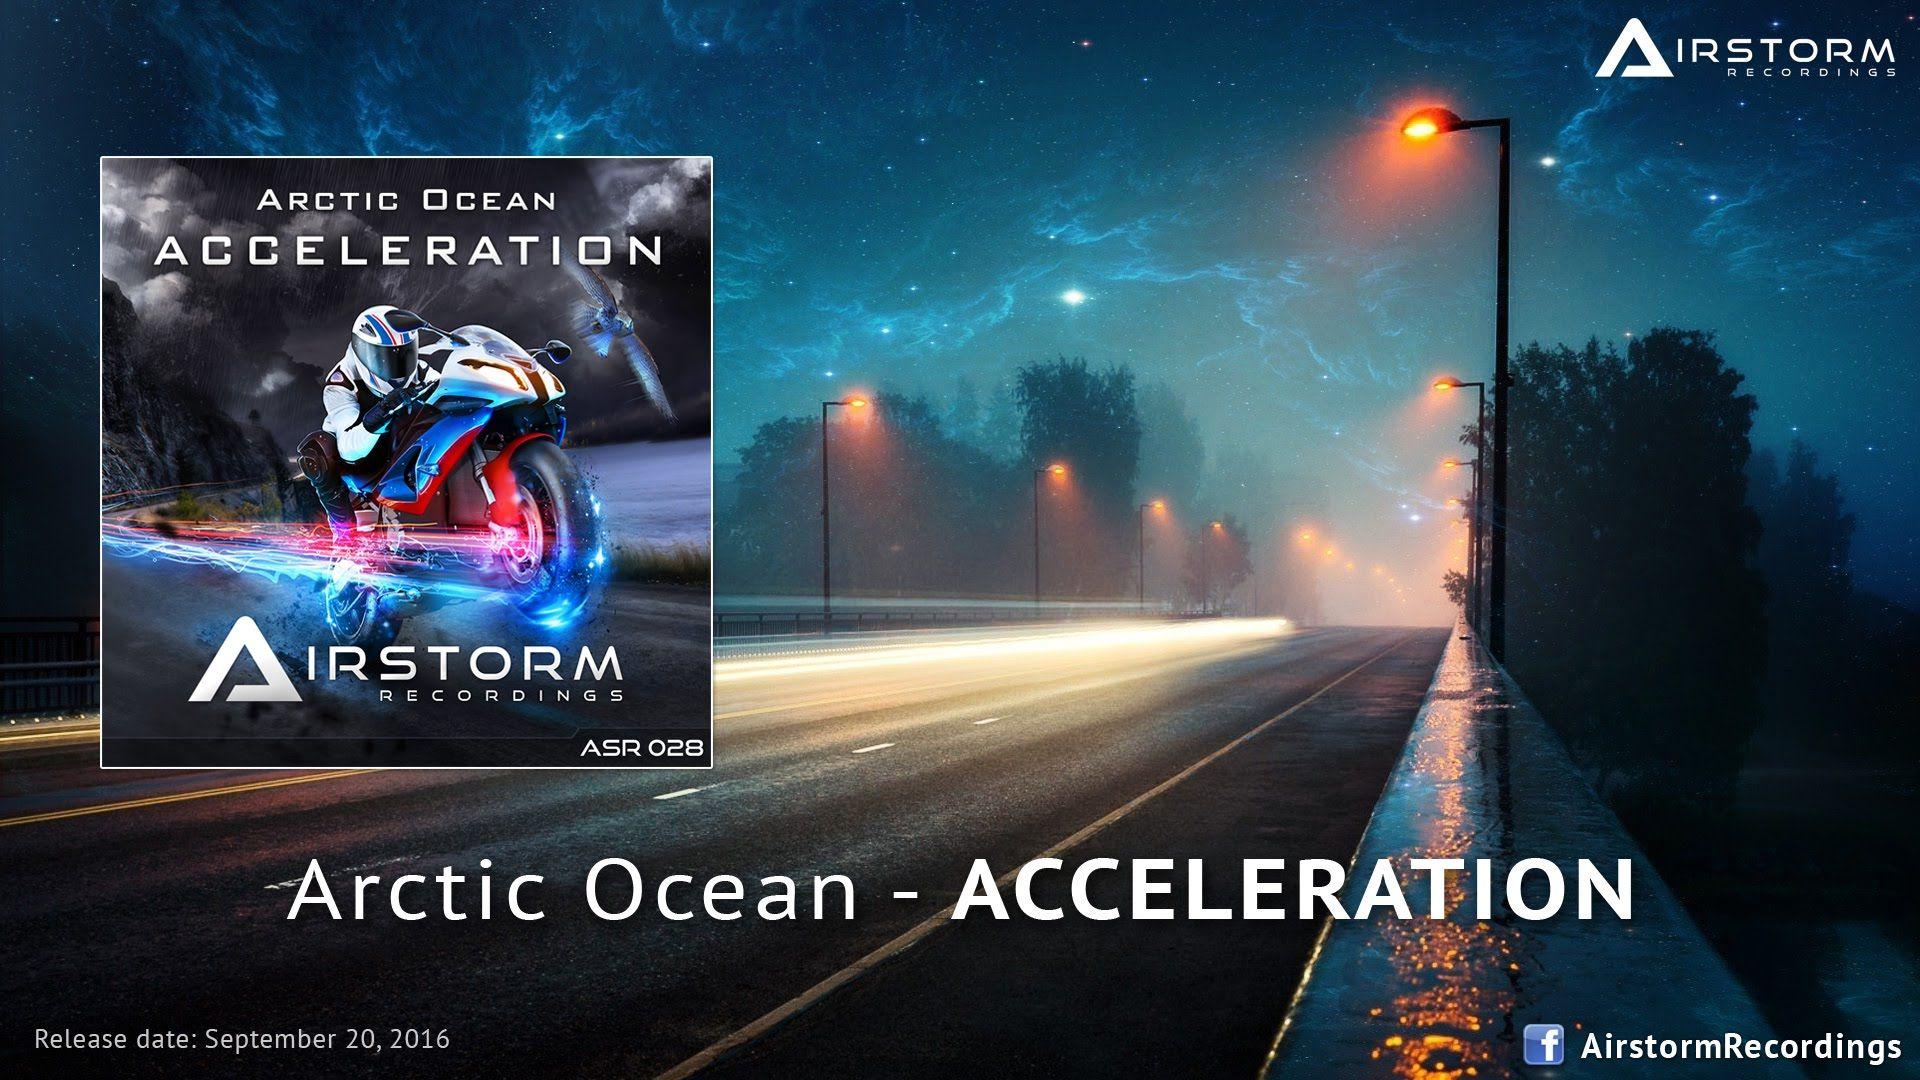 Arctic Ocean - Acceleration (Original Mix) [Airstorm Recordings] - PROMO